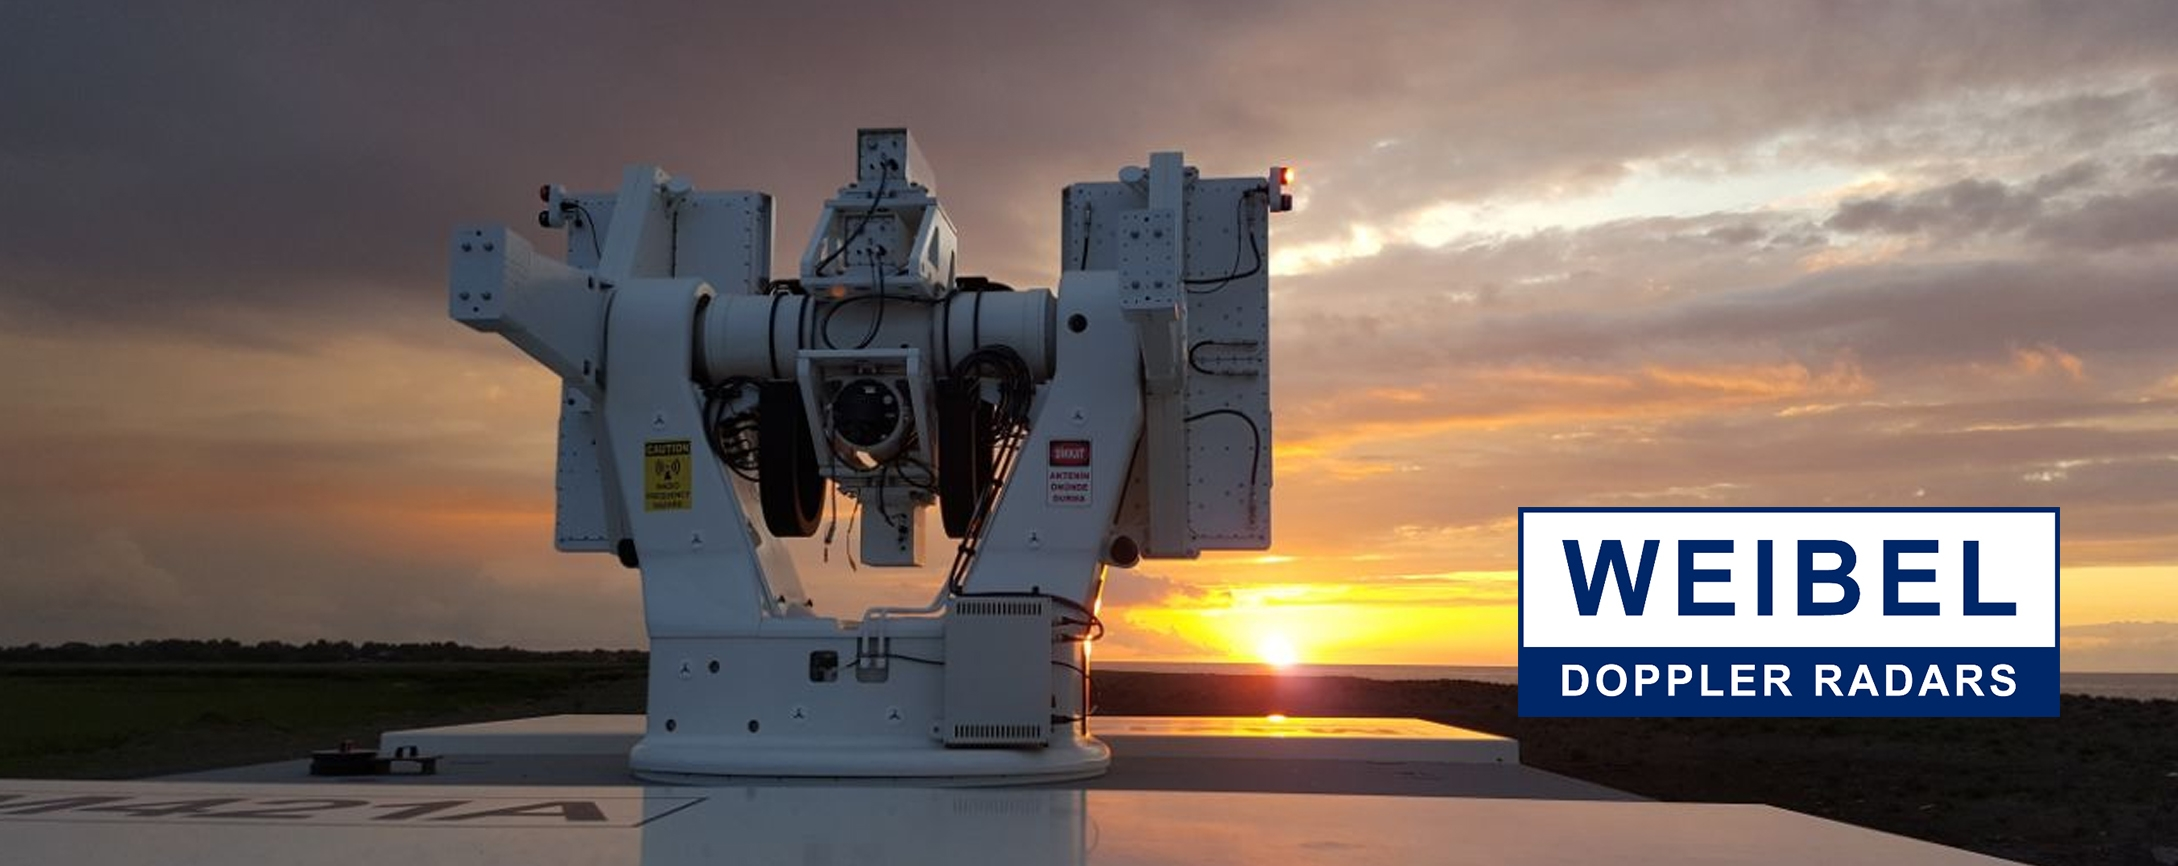 weibel doppler radars milano systems